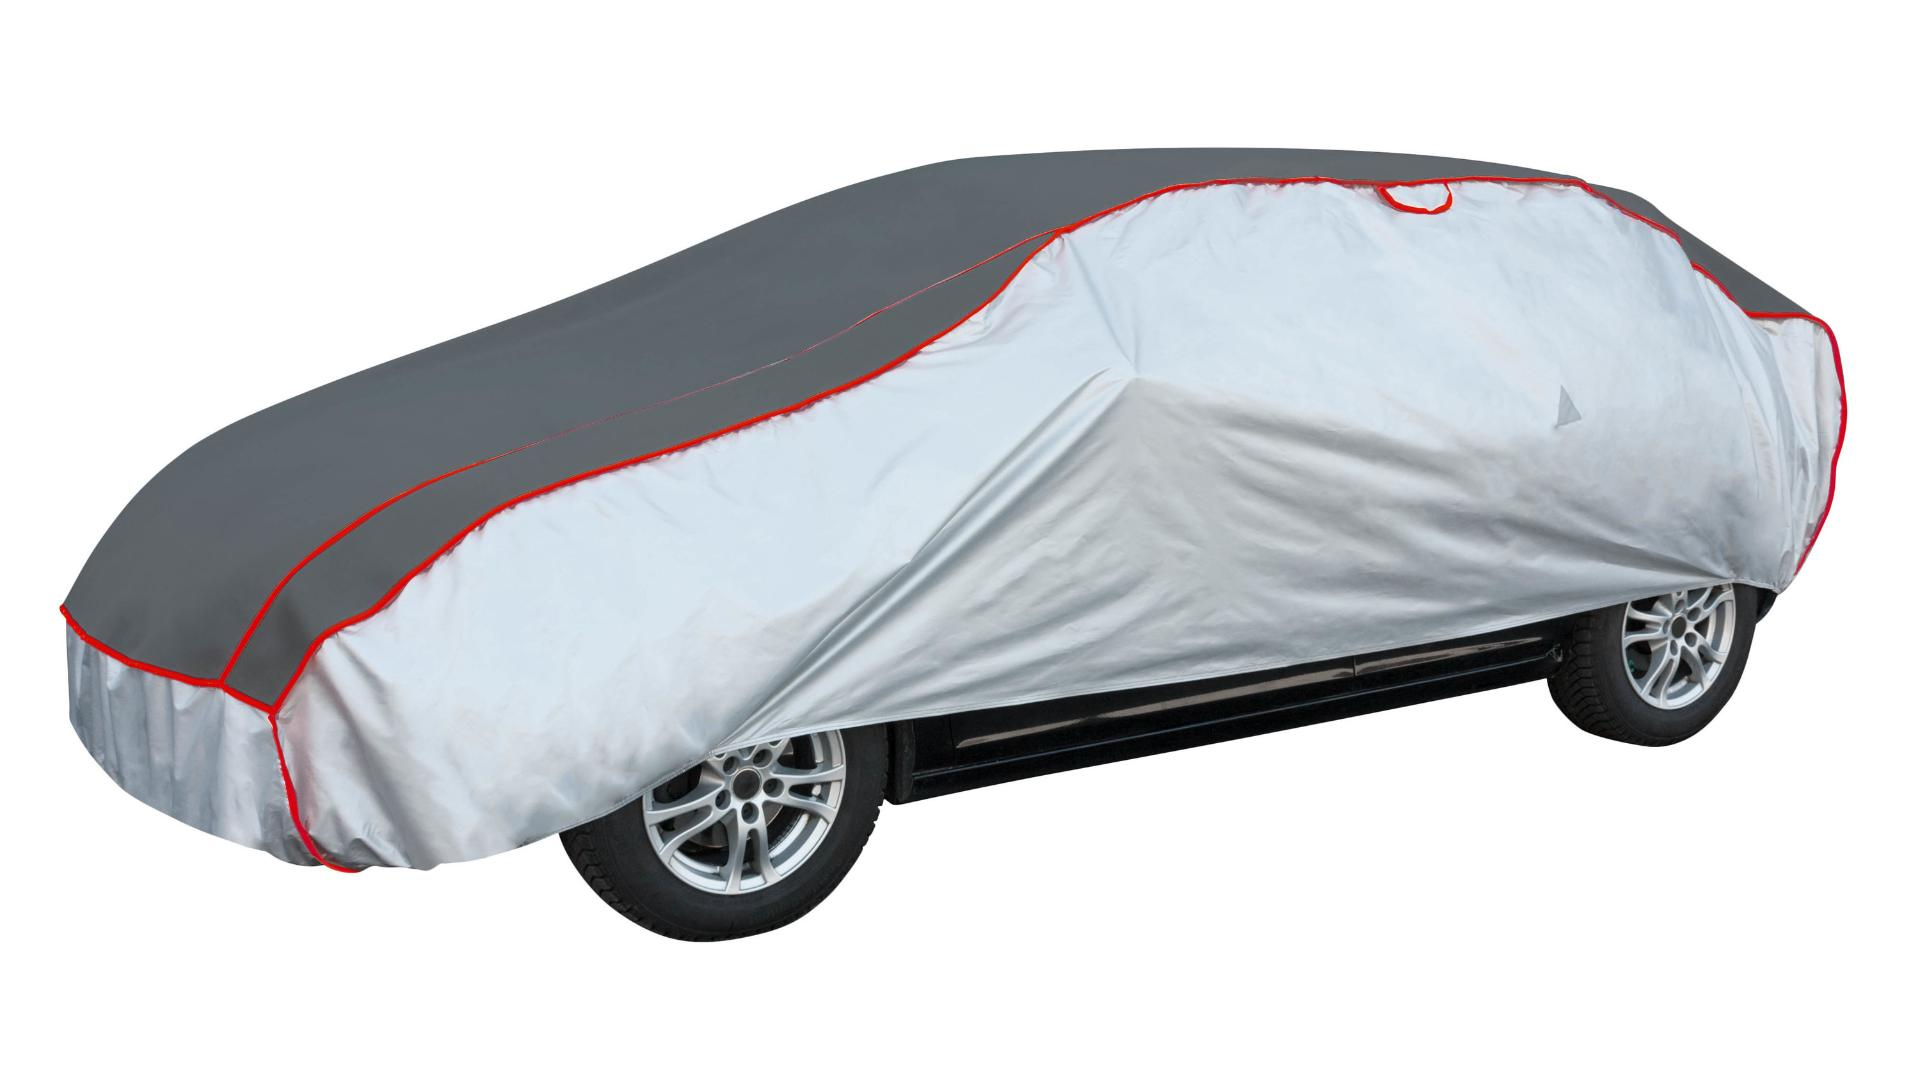 Walser plachta proti kroupám Premium Hybrid M 425x162,5x117,5cm